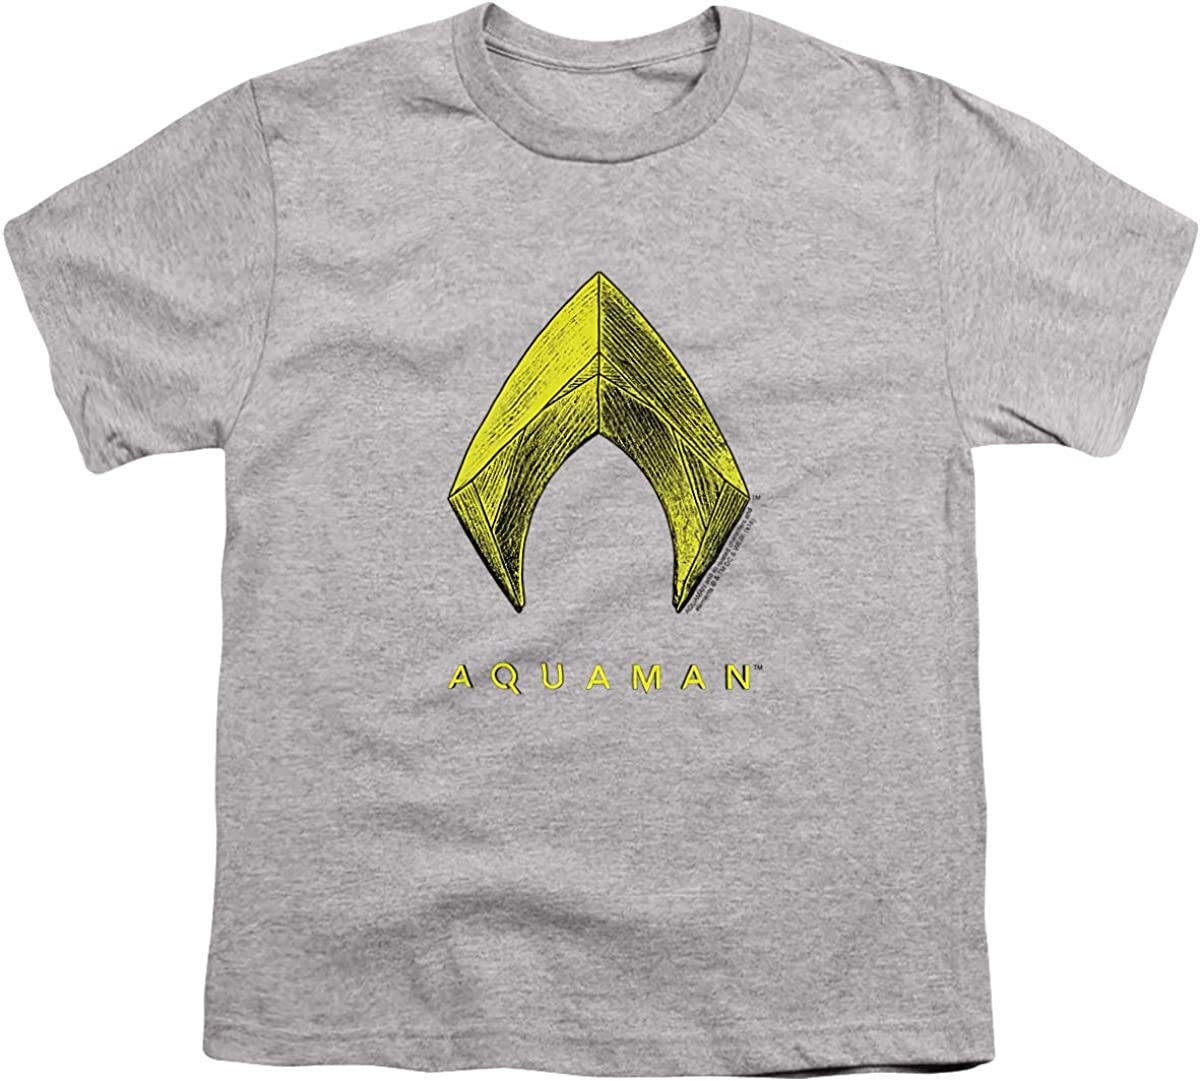 Aquaman Movie Aquaman Logo Unisex Youth T Shirt